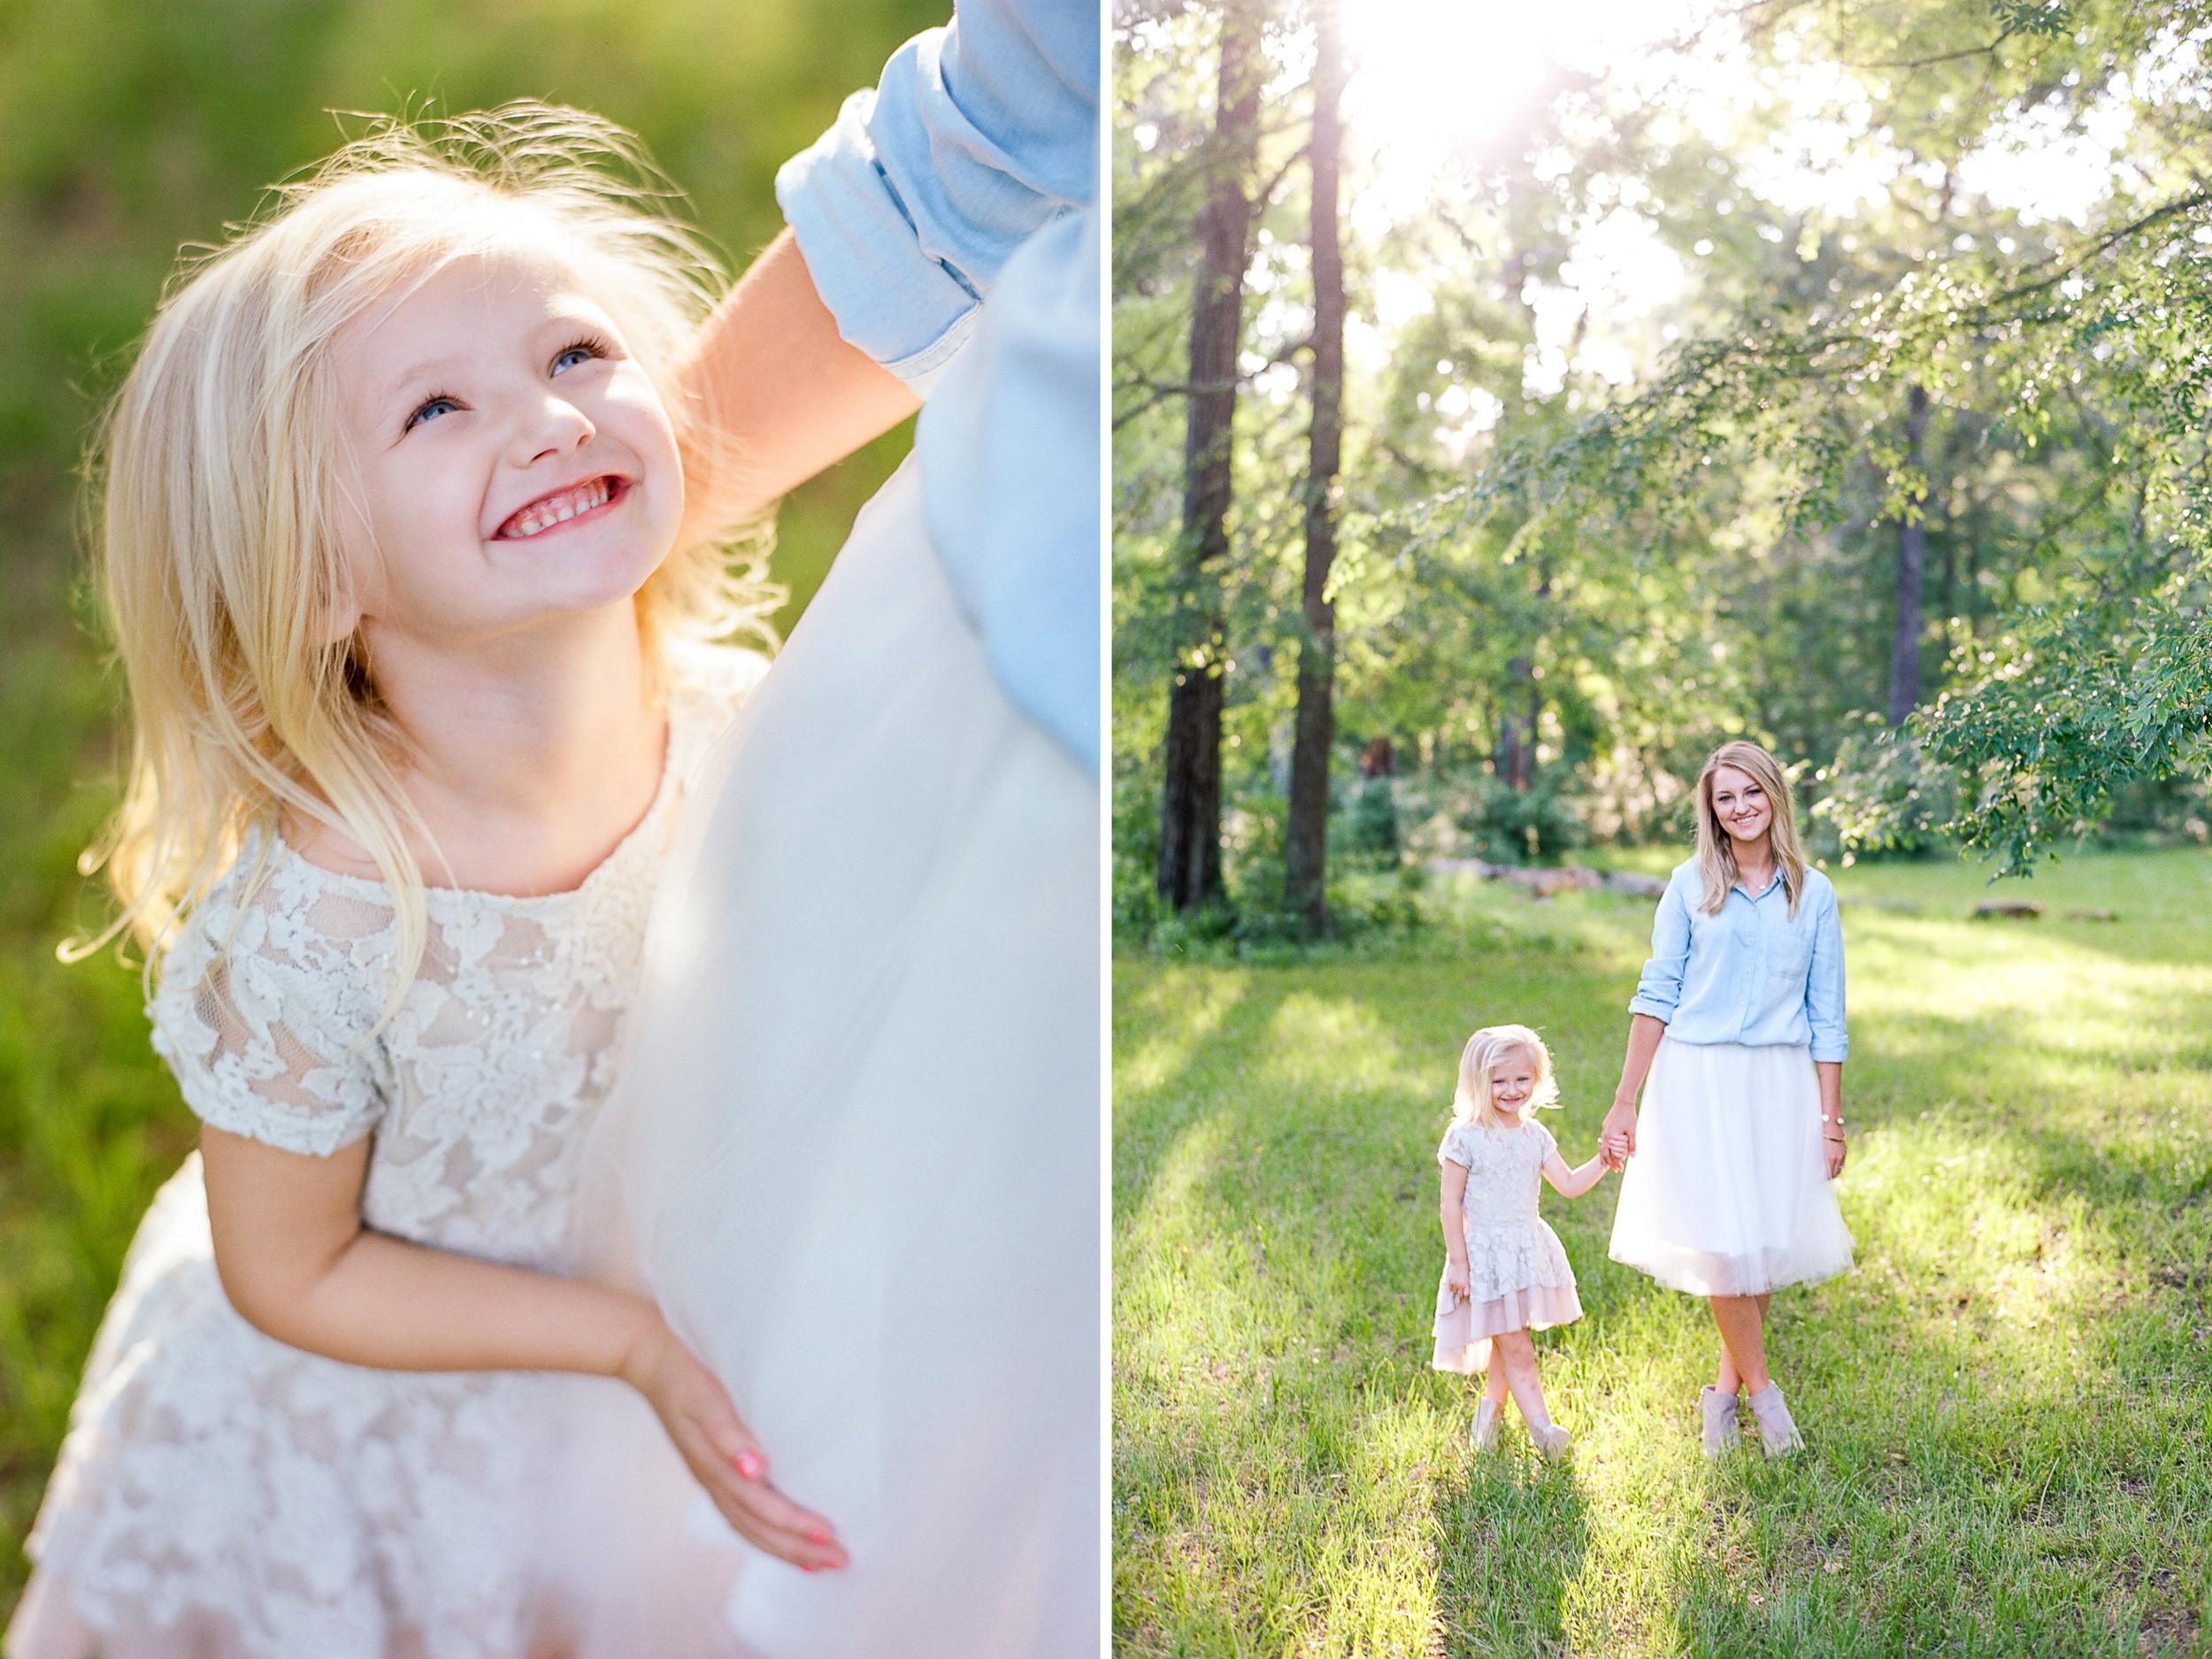 Dana-Fernandez-Photography-Houston-Portrait-Photographer-Film-Children-Family-Maternity-Senior-Photographer-206.jpg